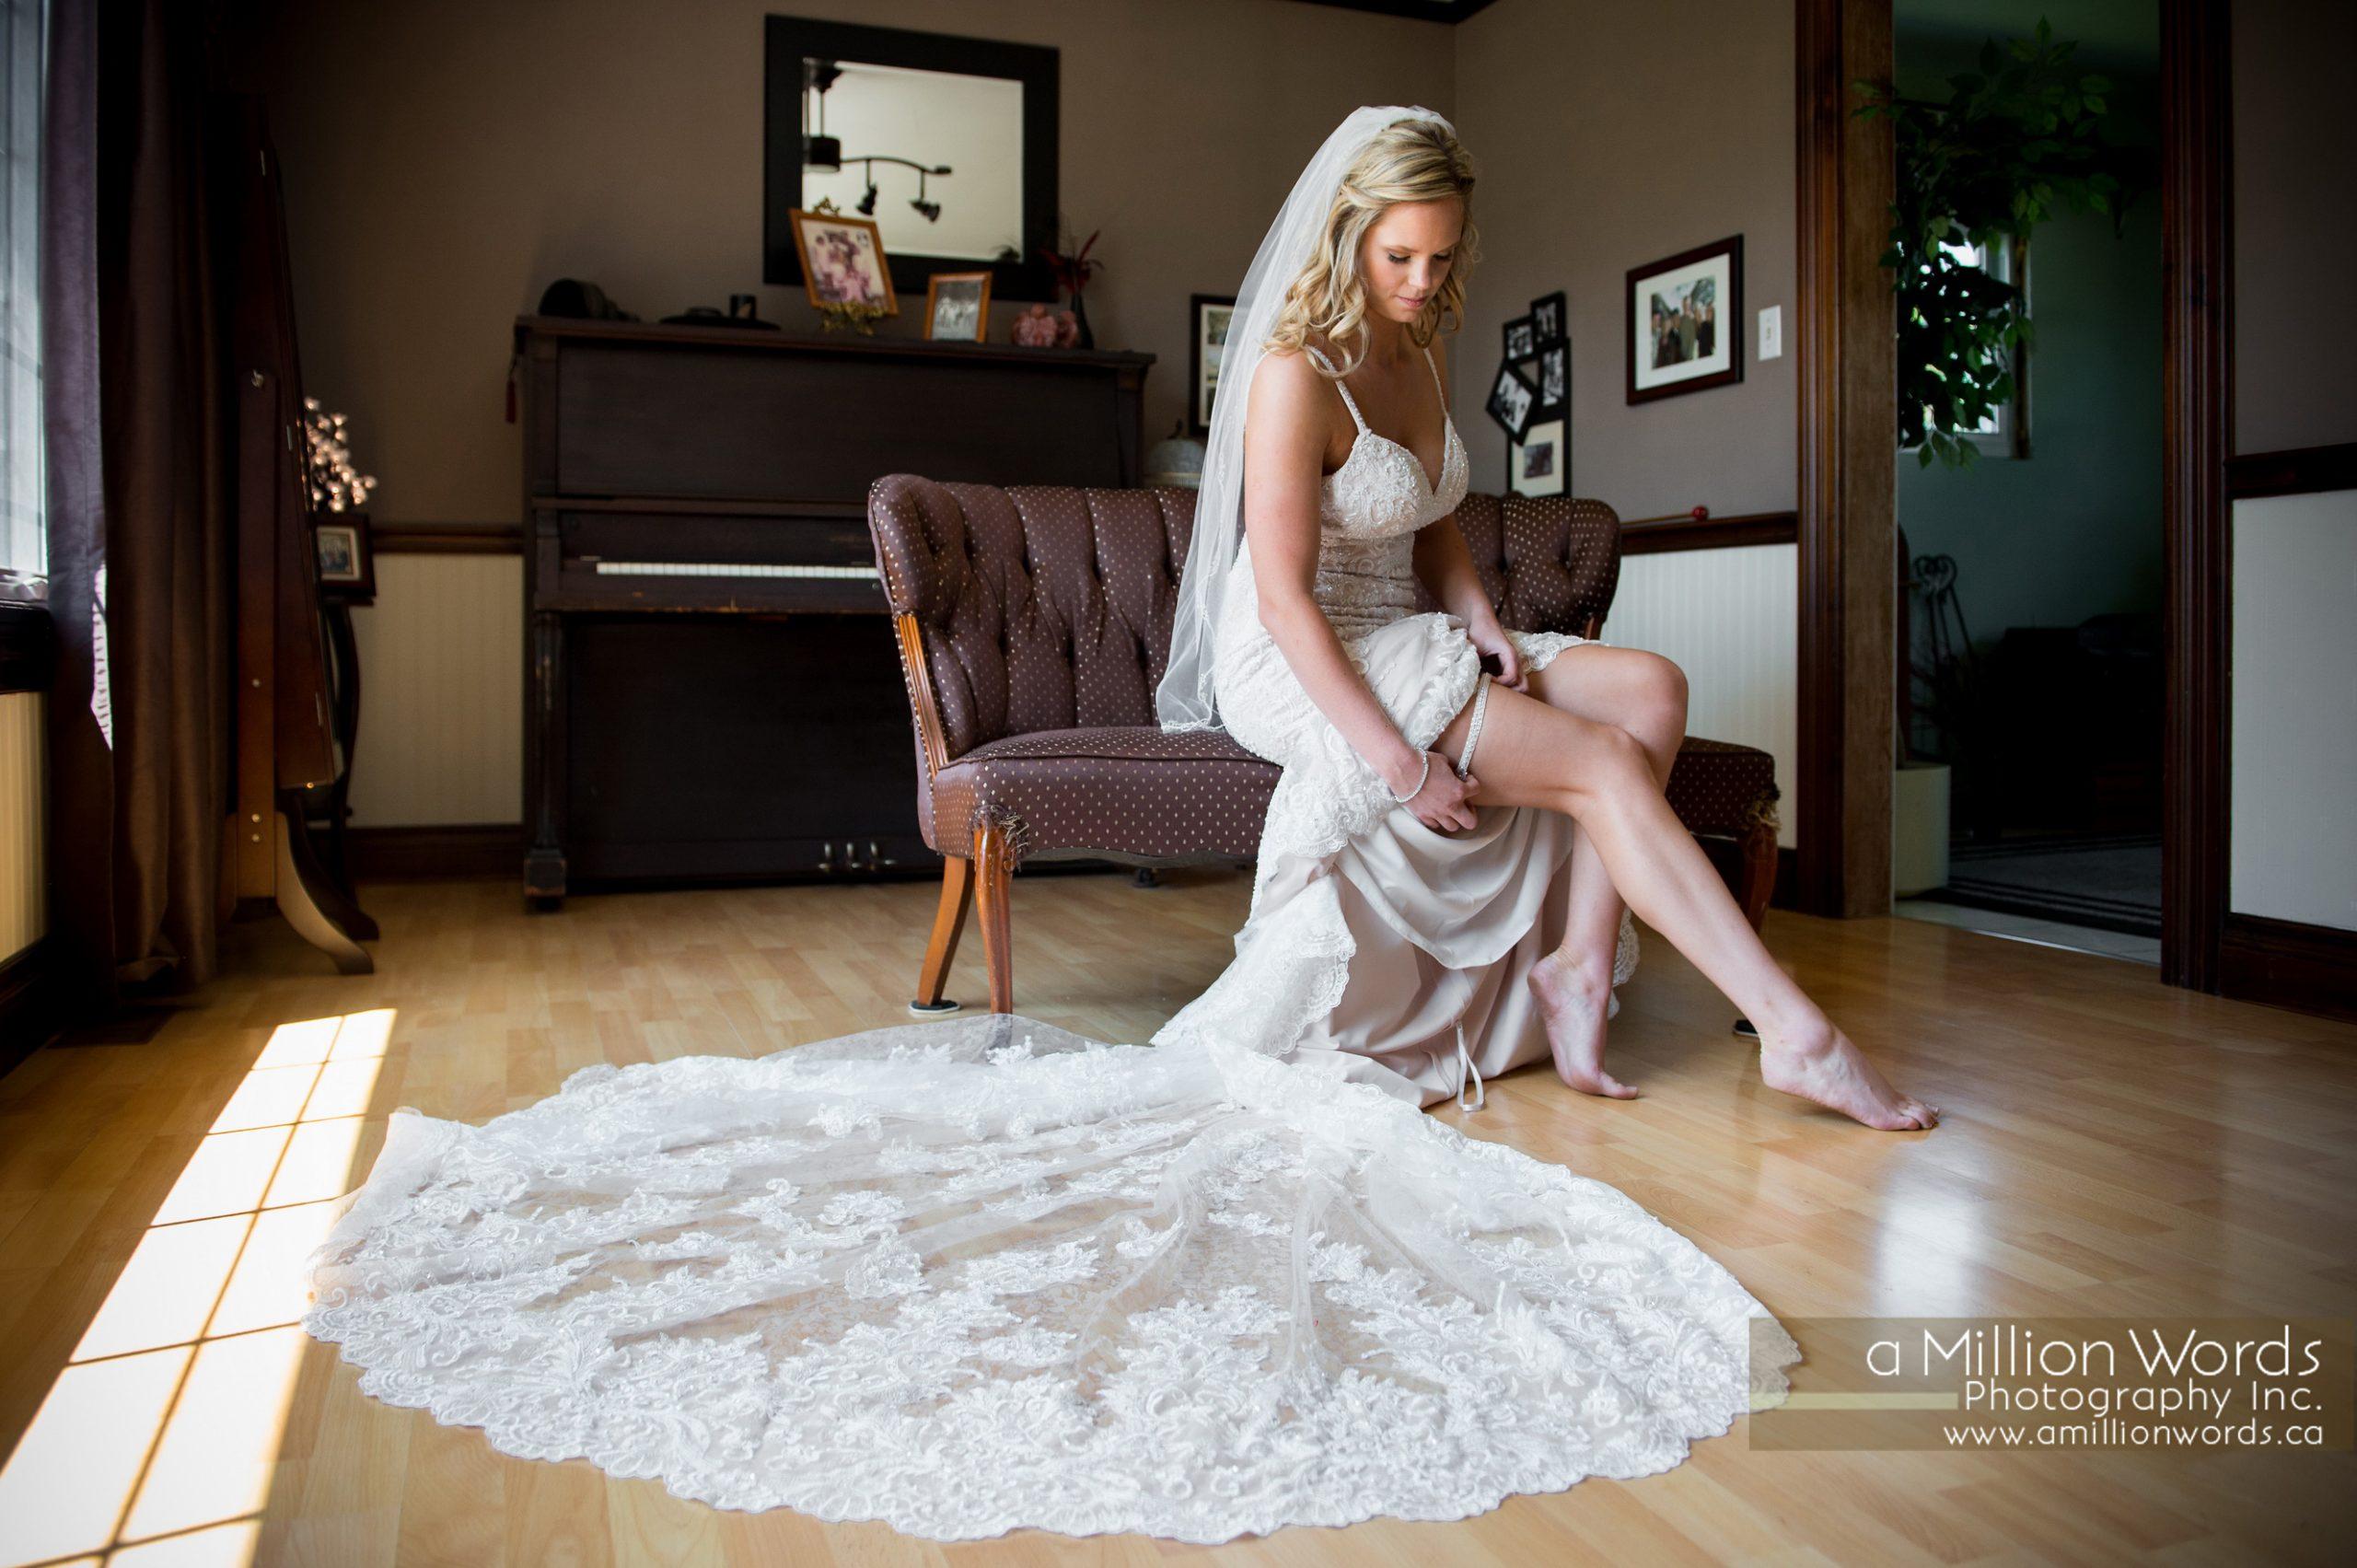 arthur_wedding_photographer23